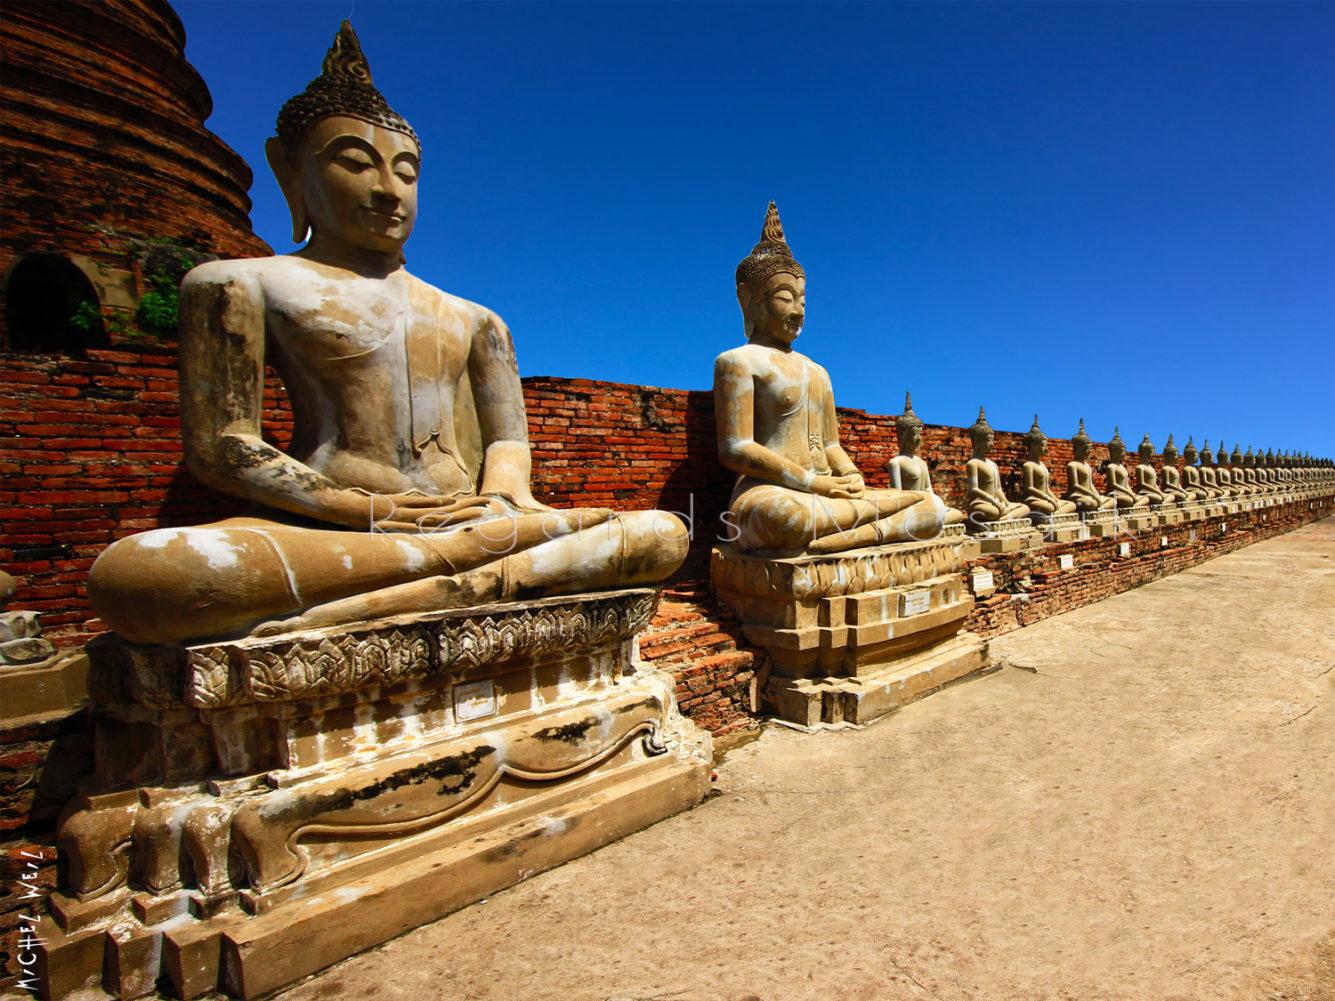 Les Bouddhas d'Ayutthaya